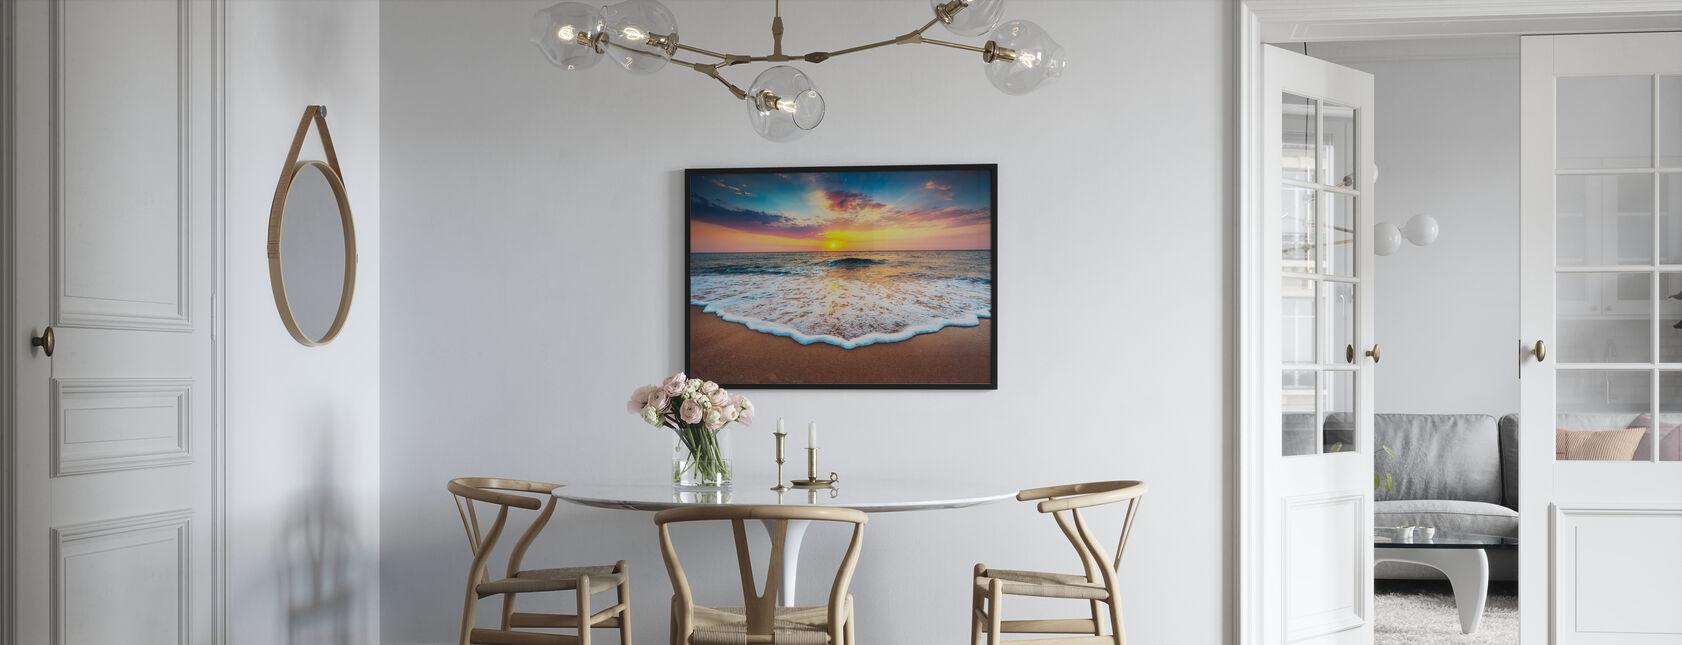 Sunrise and Dreams - Framed print - Kitchen